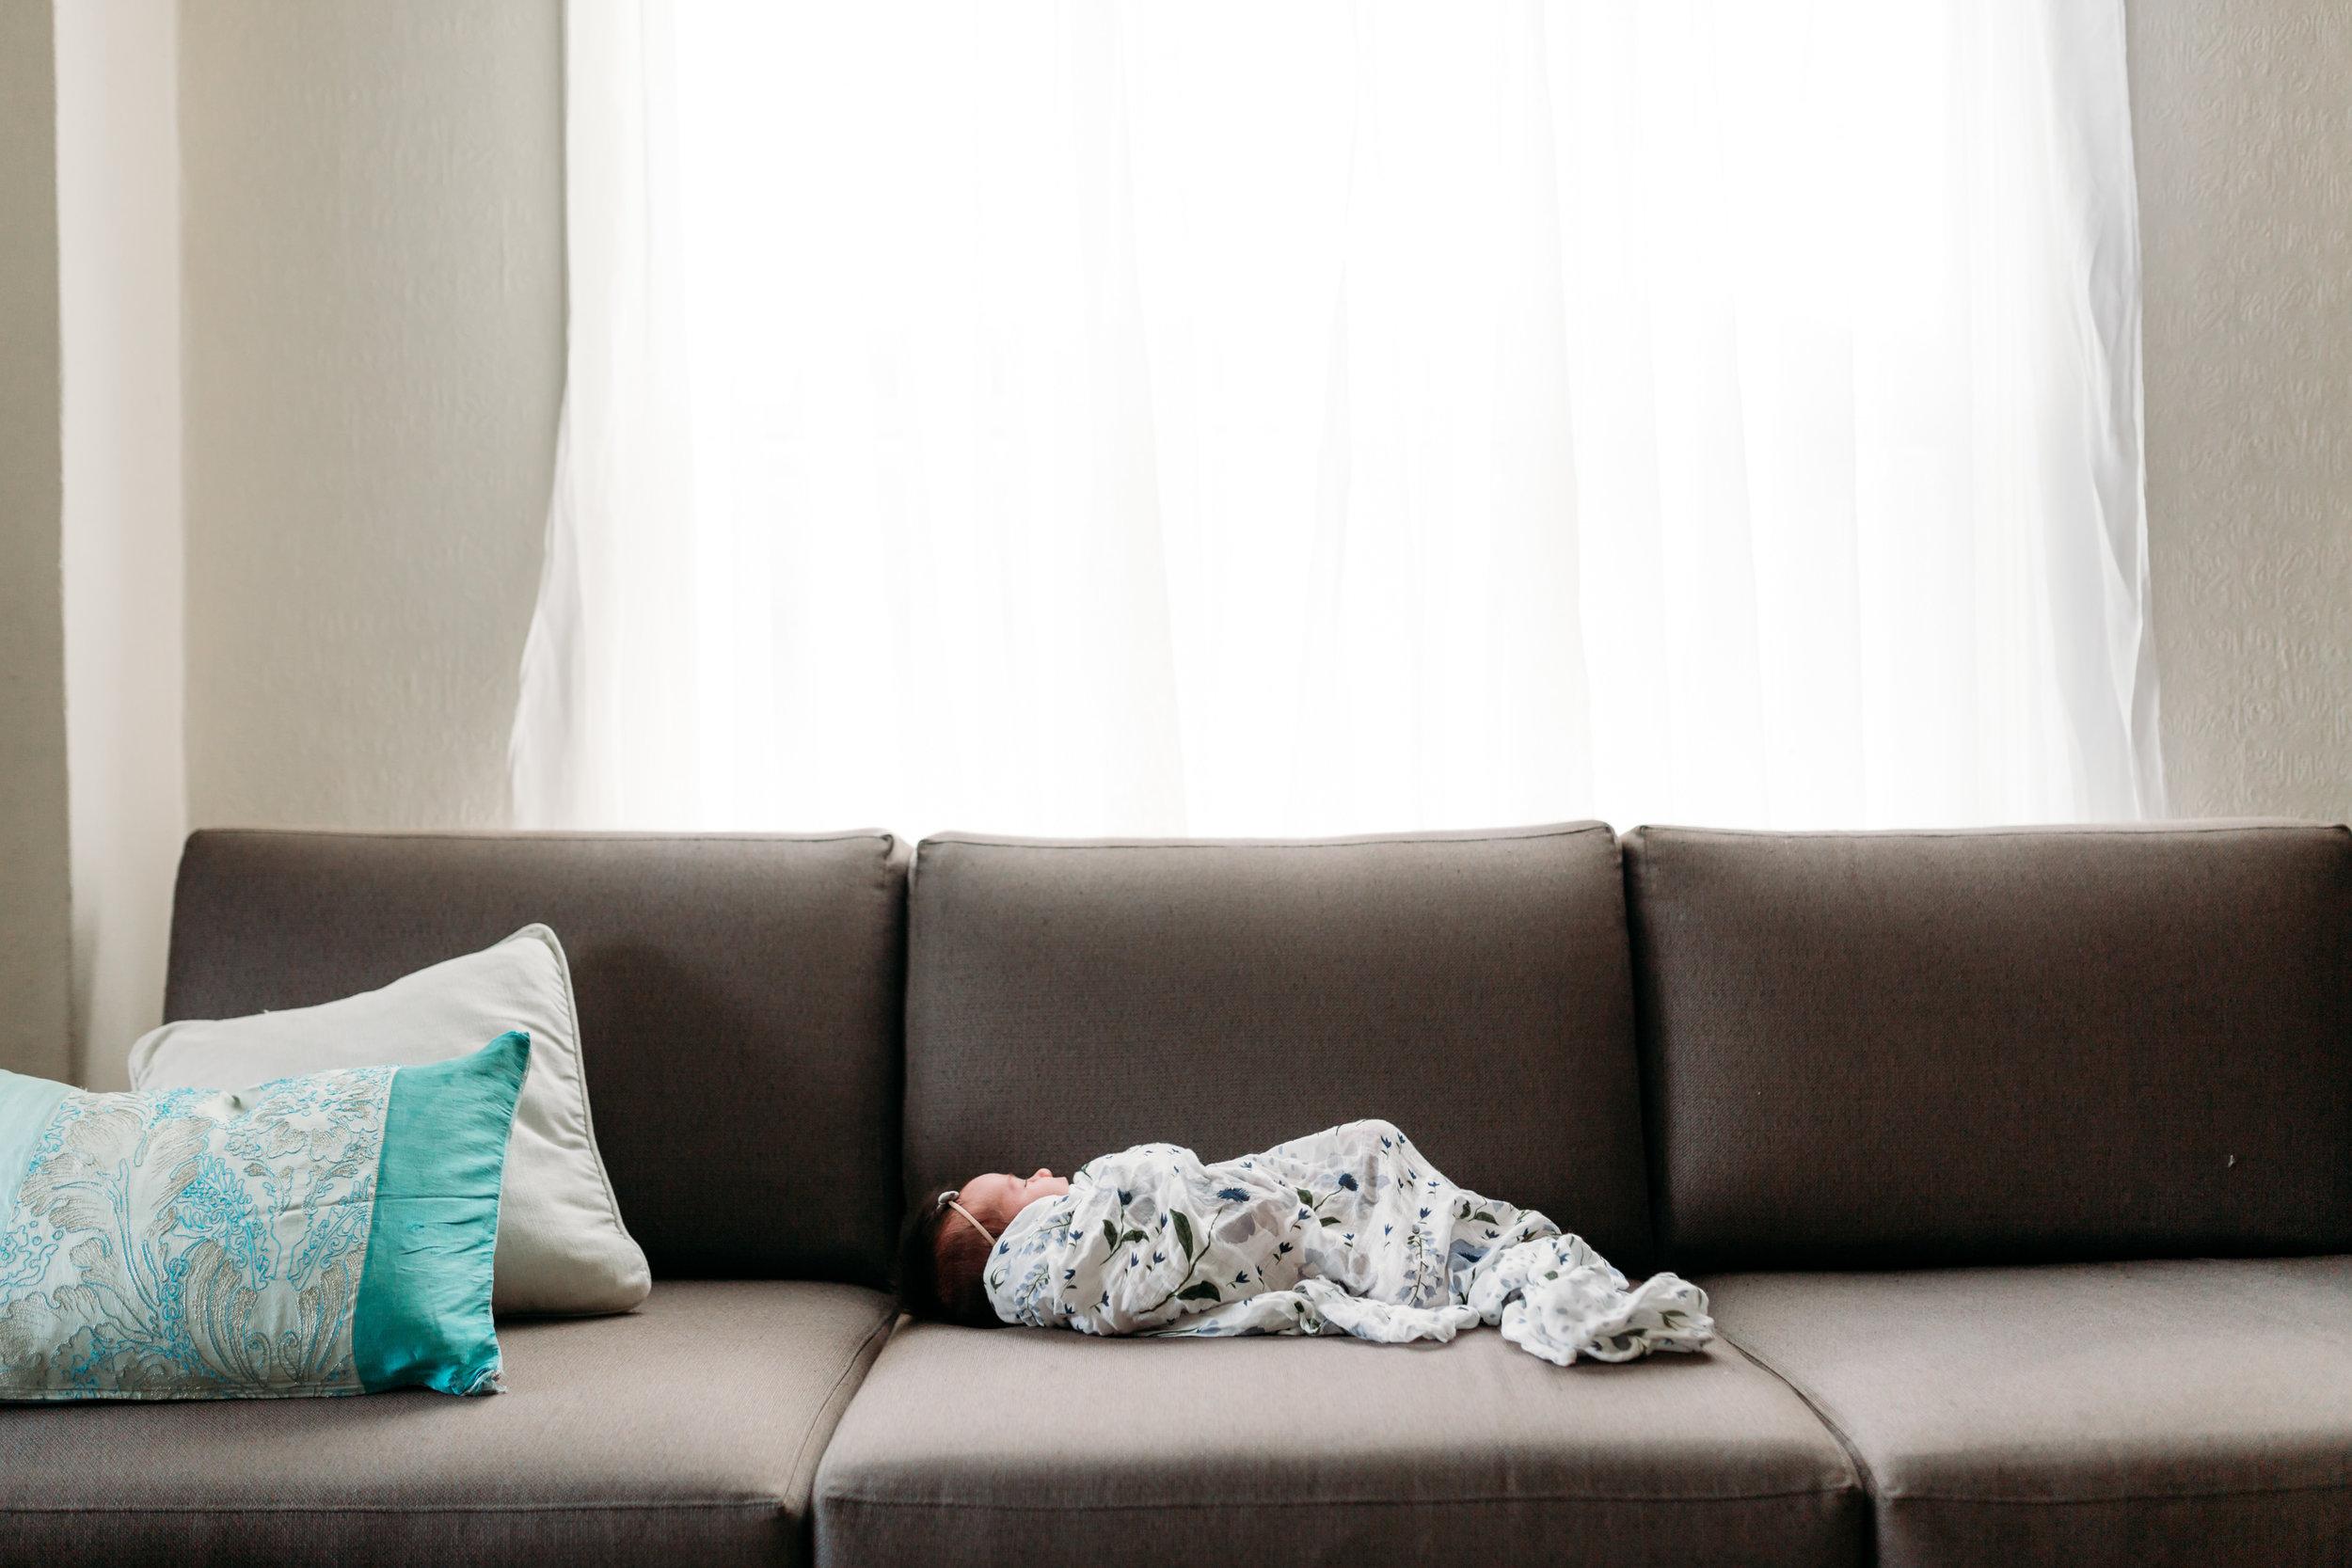 newborn-photography-baby-floral-little-unicorn-blanket